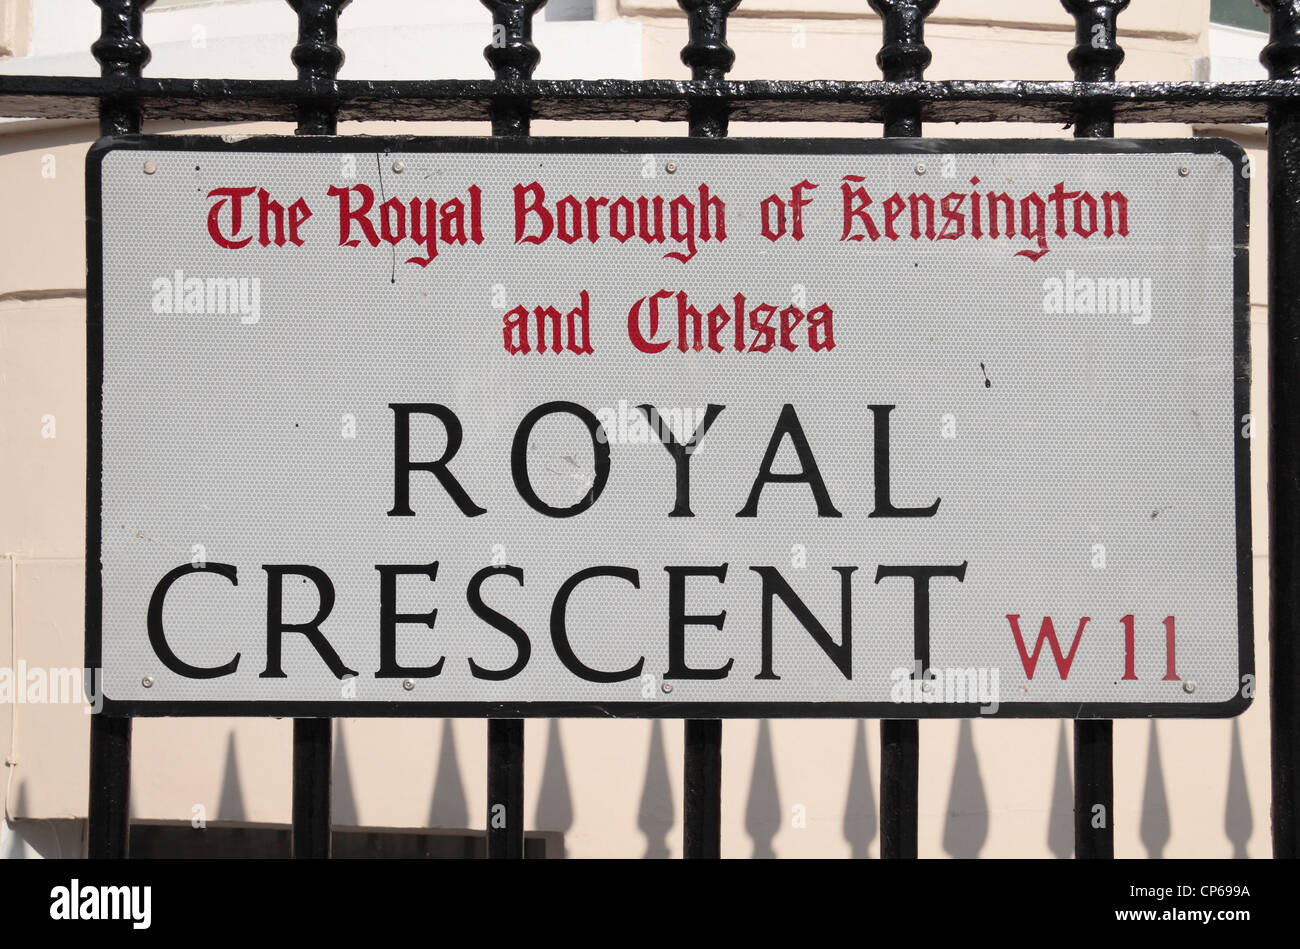 Ciudades del mundo (A a la Z) - Página 5 Street-sign-for-royal-crescent-w11-in-the-royal-borough-of-kensington-CP699A